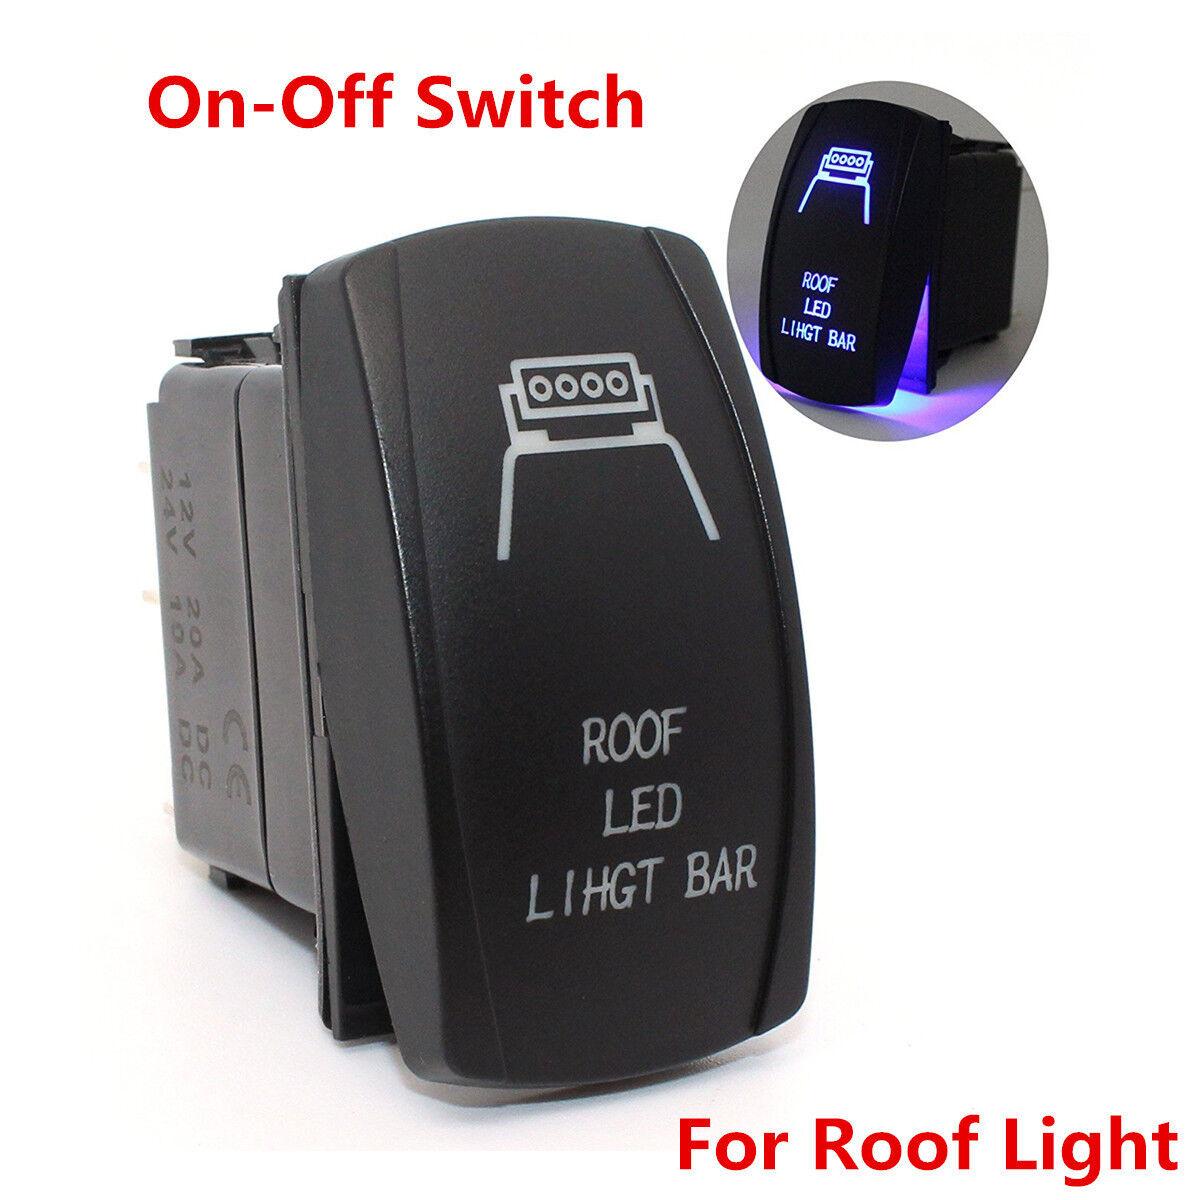 Rocker Switch 612W 12 voltios luces de techo Carling láser grabado tjm Offroad 4x4 4wd